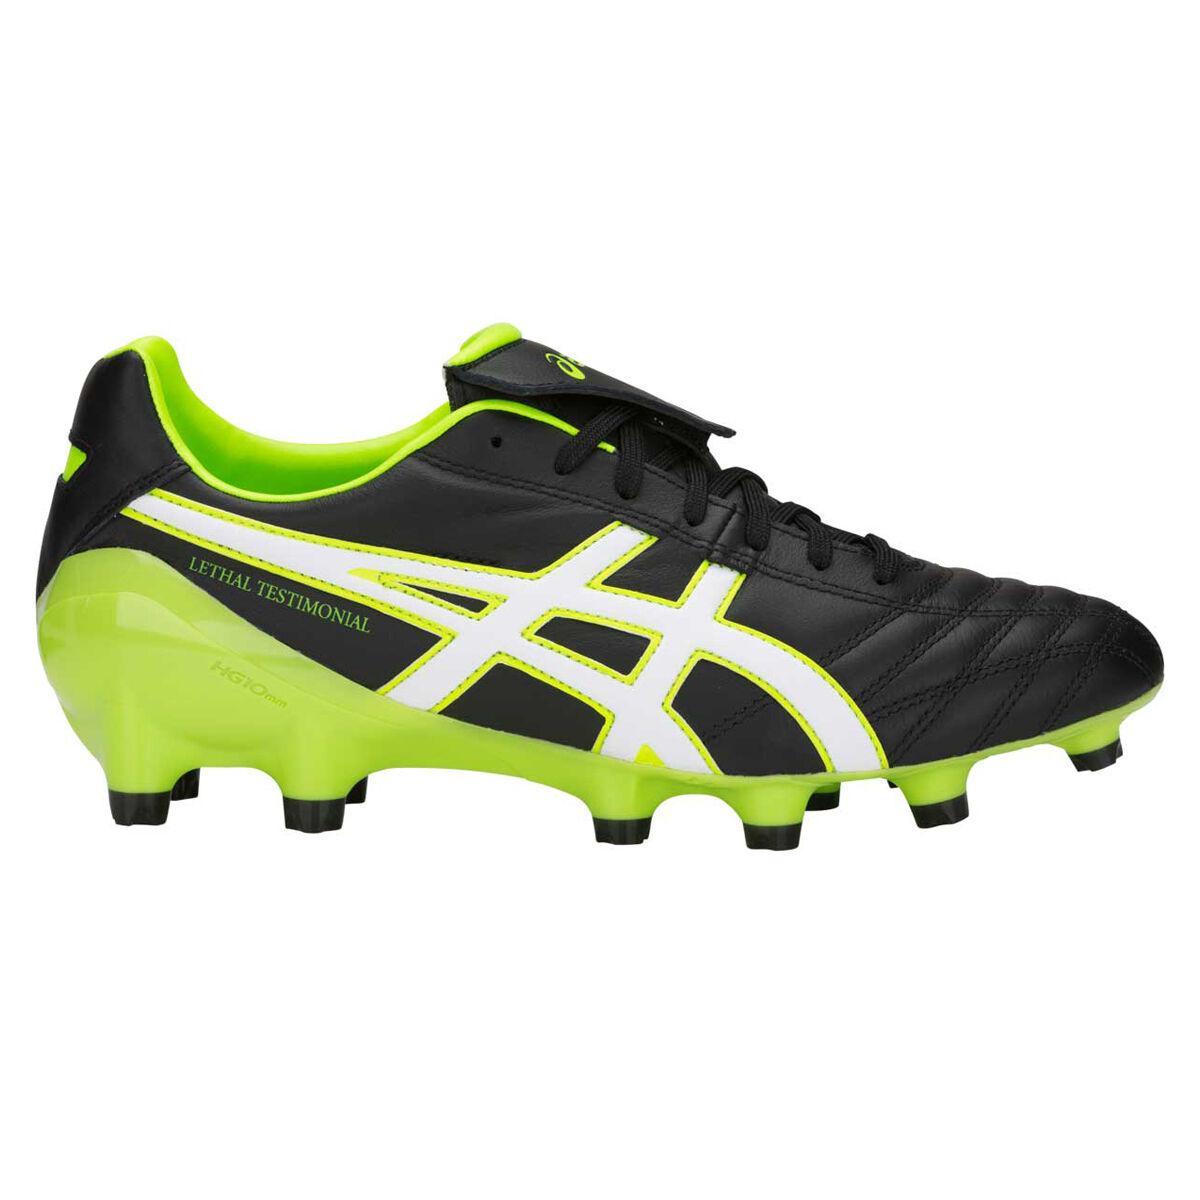 all black asics football boots